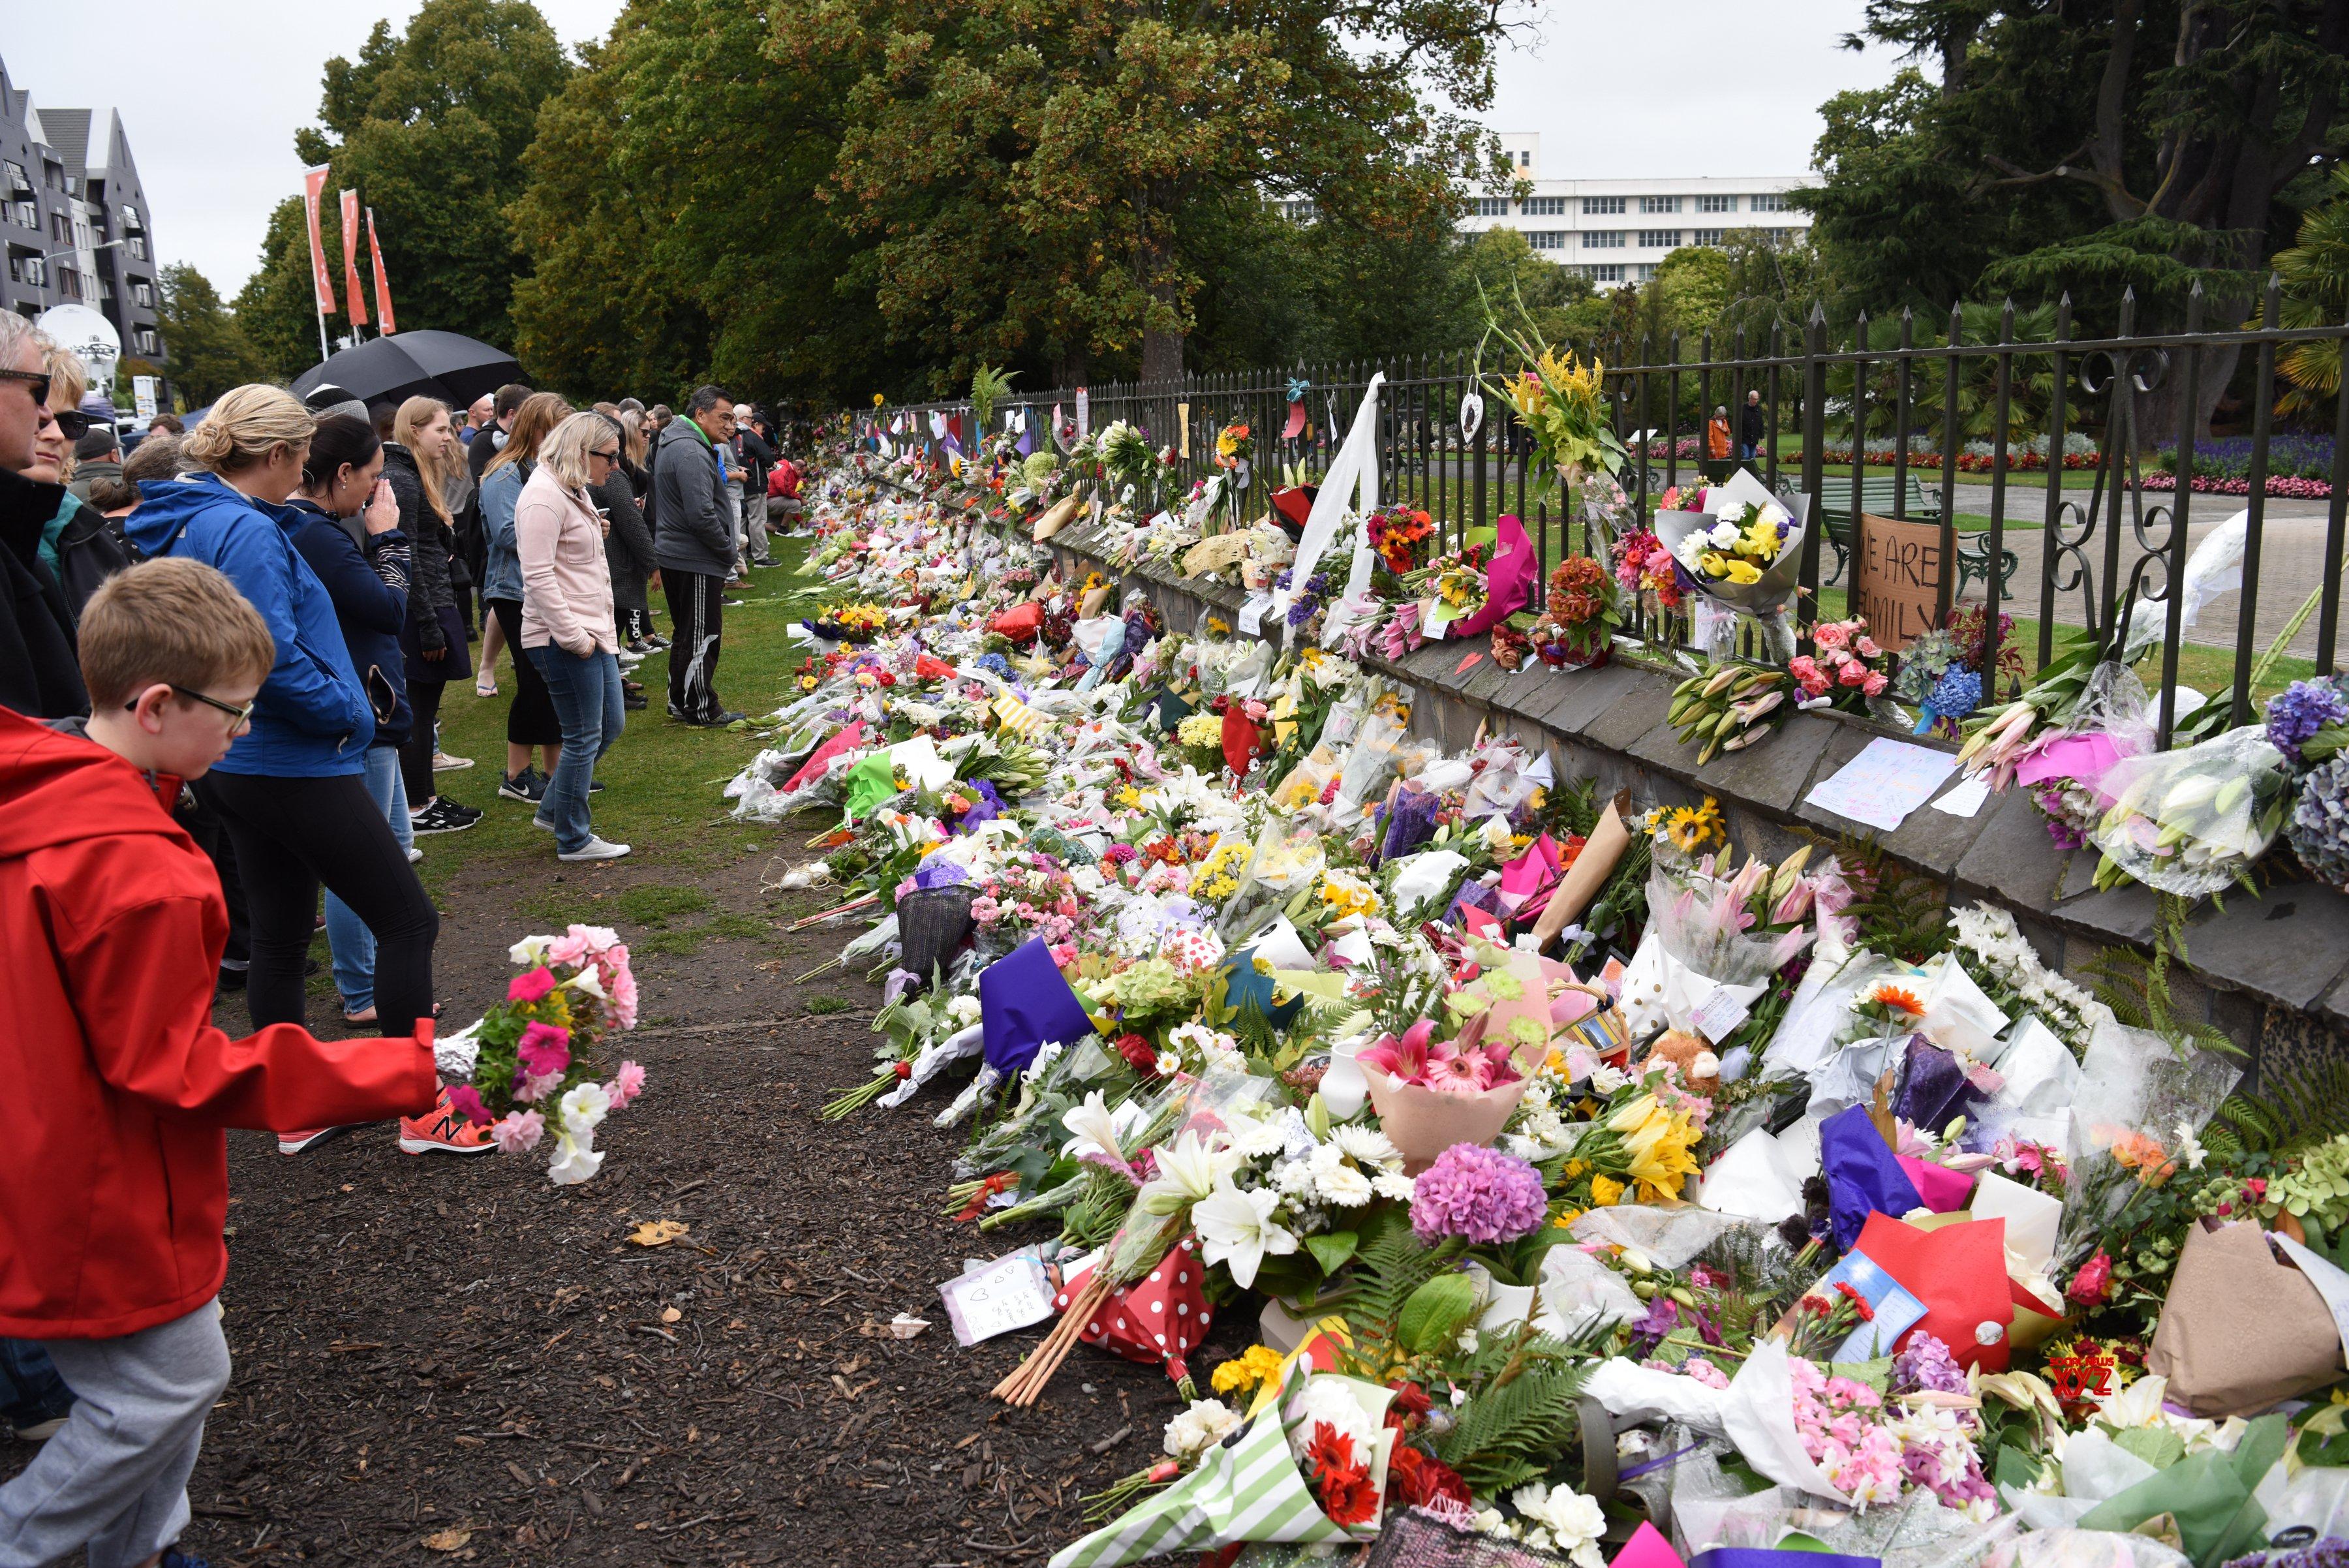 EW ZEALAND - CHRISTCHURCH - MOURNING #Gallery